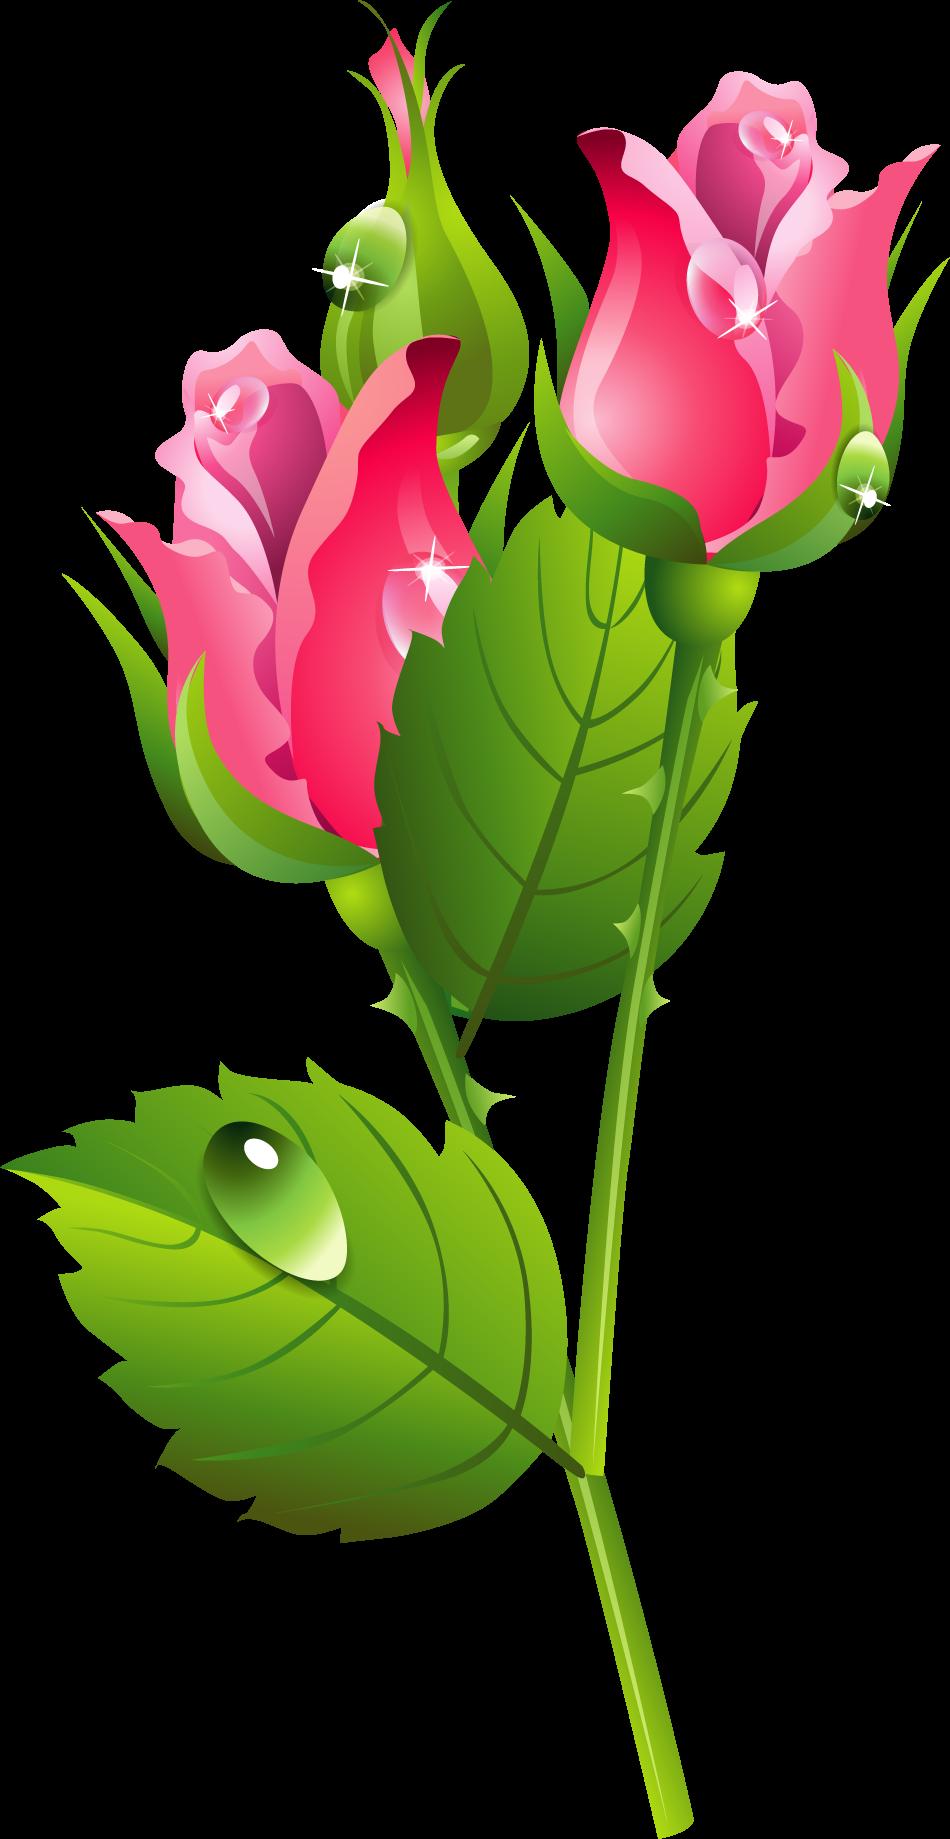 Romantic Pink Flower Border PNG Transparent Image SVG Clip arts